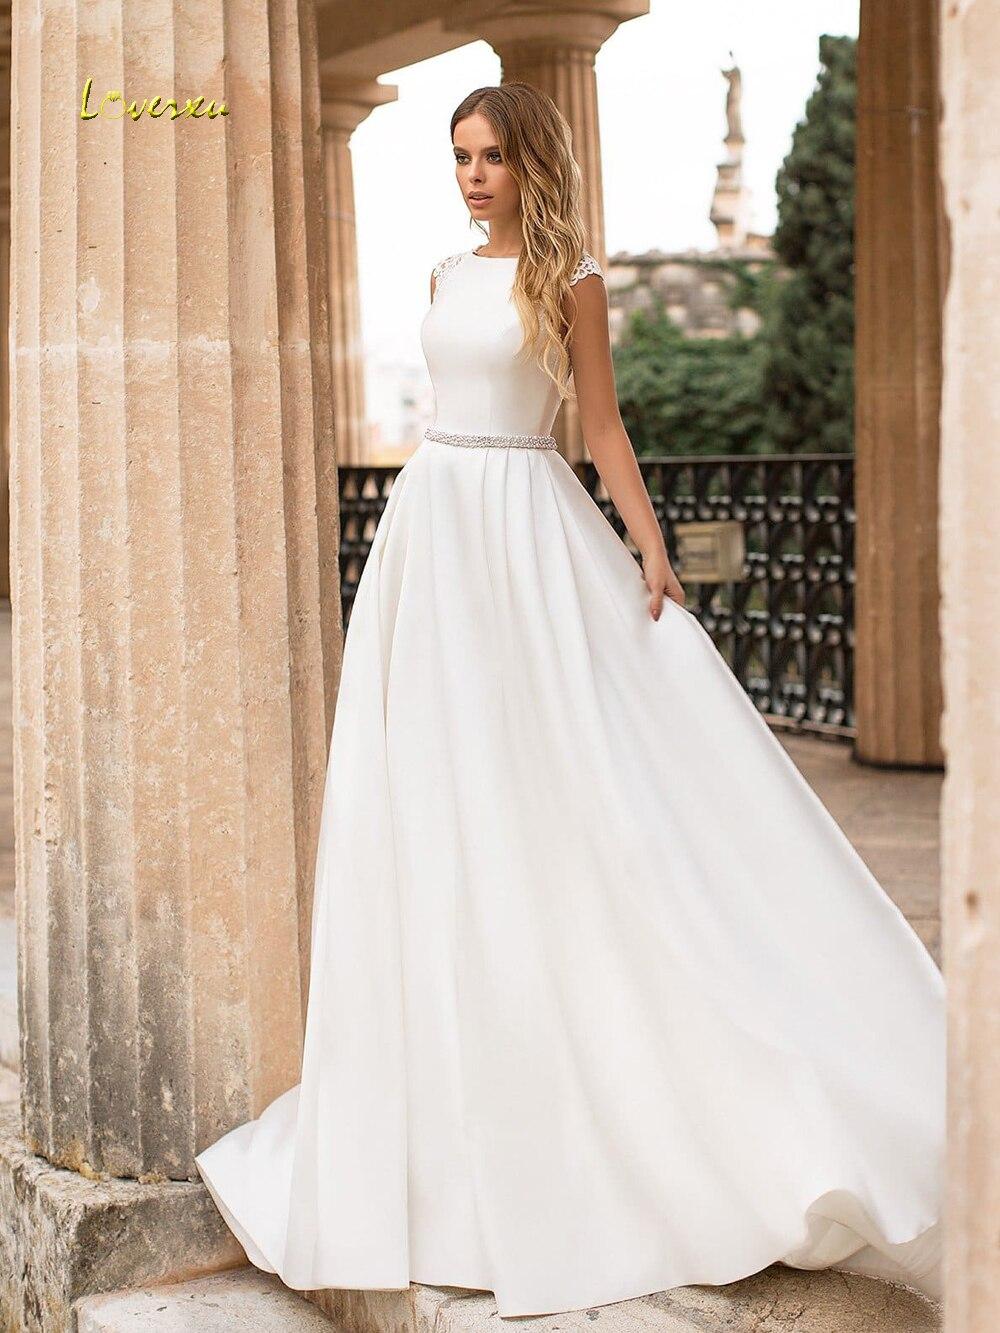 f0c97479de51d Loverxu Scoop Neck Matte Satin Vintage Wedding Dresses 2019 Elegant ...